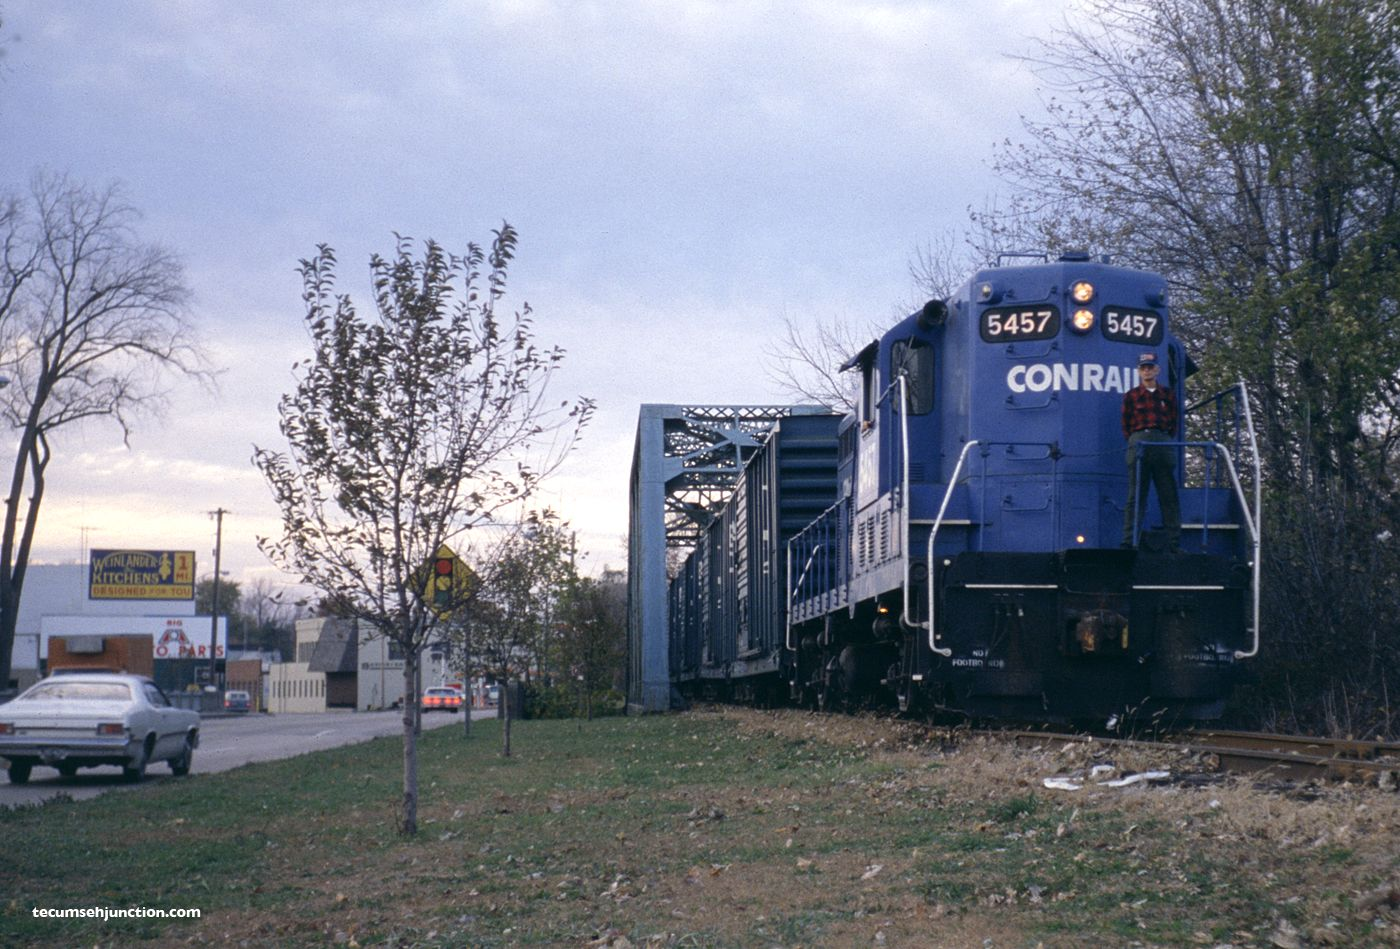 Conrail engineer Dale Stultz poses on Conrail GP-8 #5457 at Blissfield, Michigan on November 3, 1980.